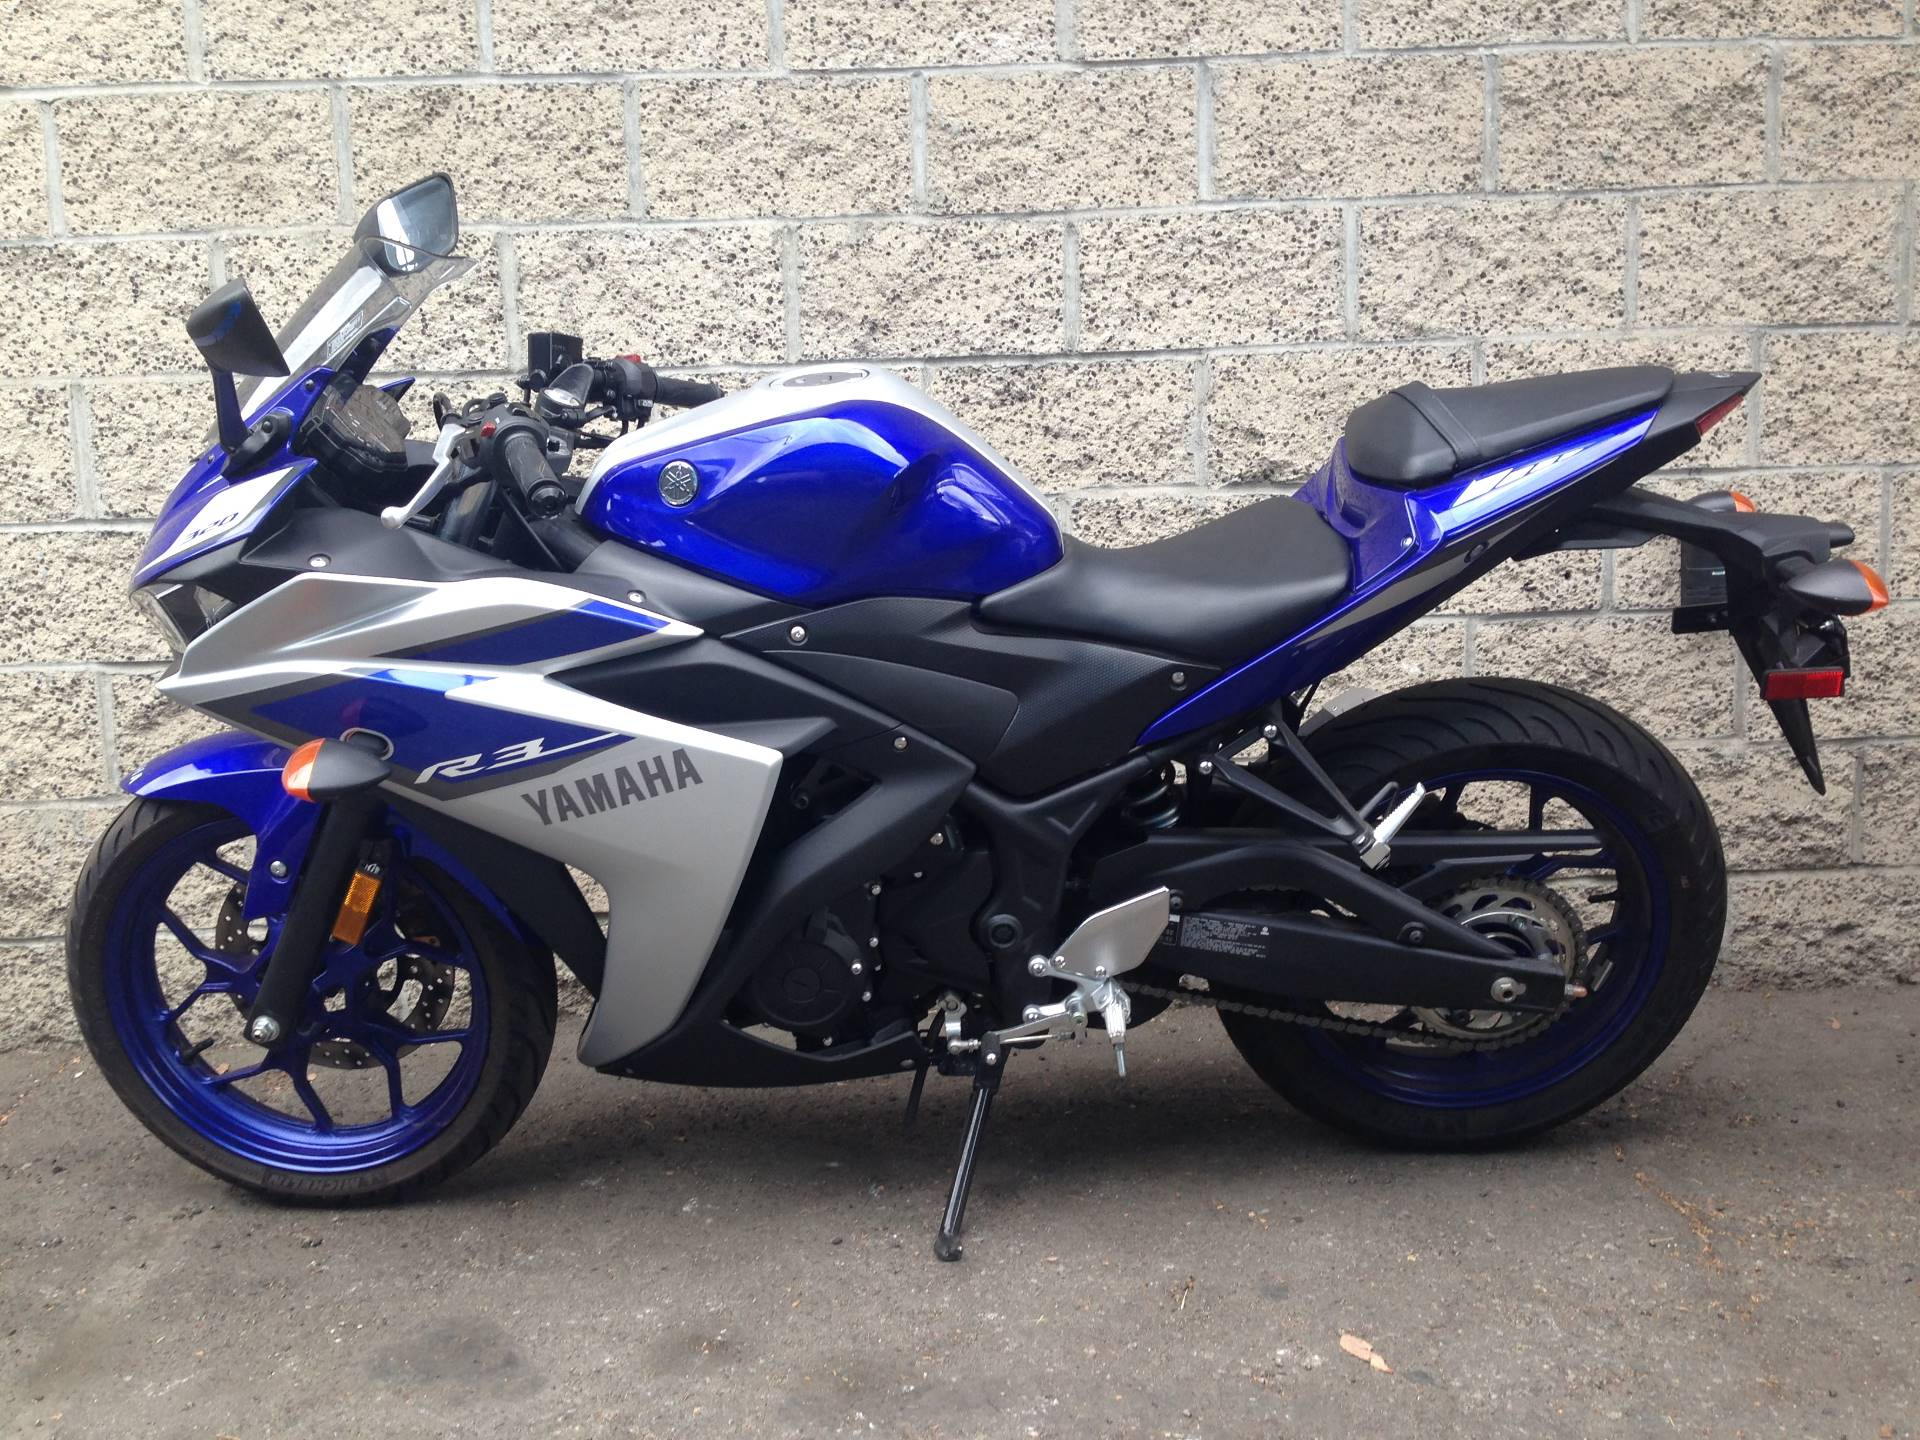 2015 Yamaha YZF-R3 4